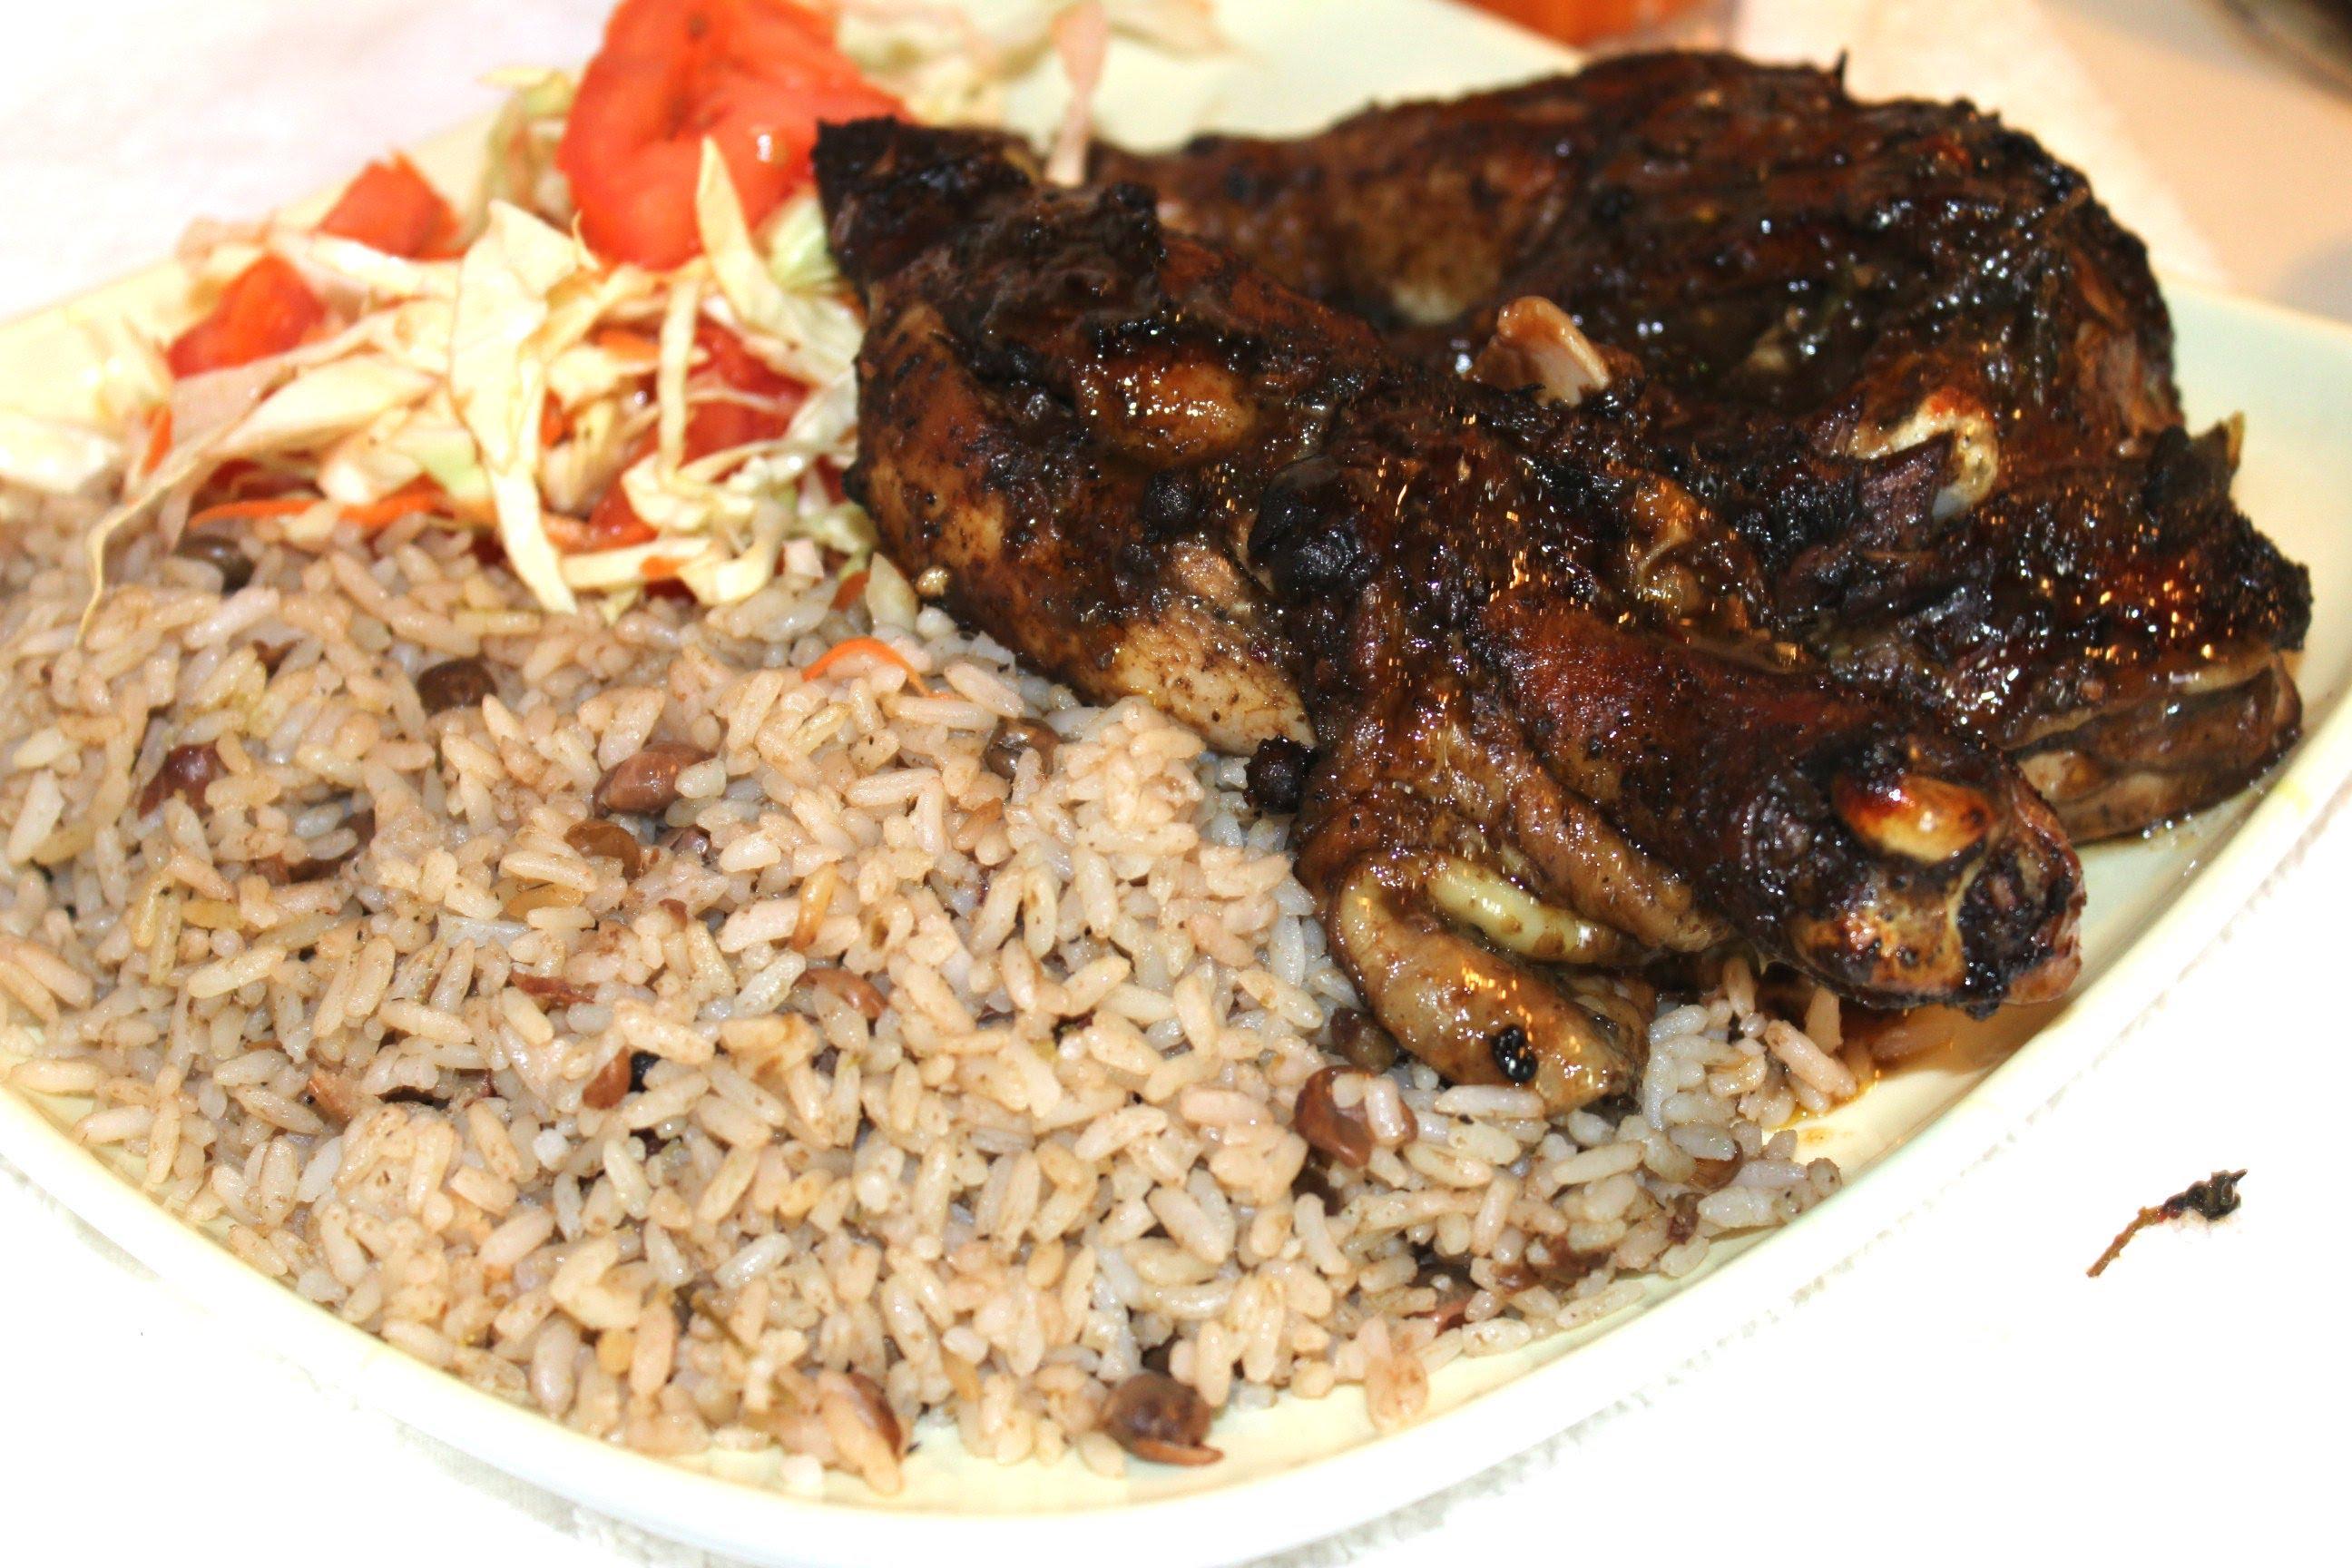 How to cook real jamaican jerk chicken hot spicy caribbean meal how to cook real jamaican jerk chicken hot spicy caribbean meal recipe 2014 forumfinder Gallery